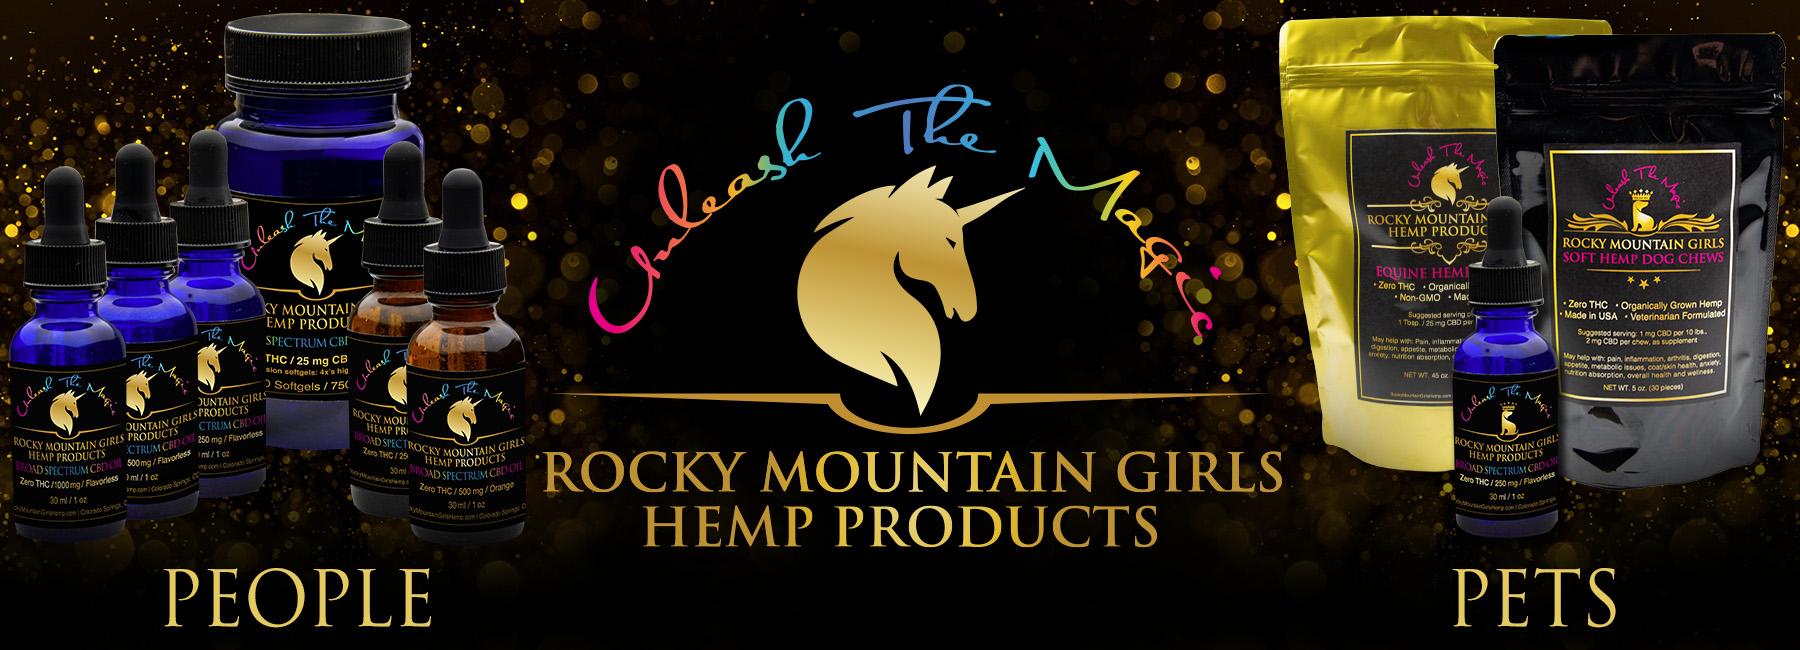 Rocky Mountain Girls Hemp Products